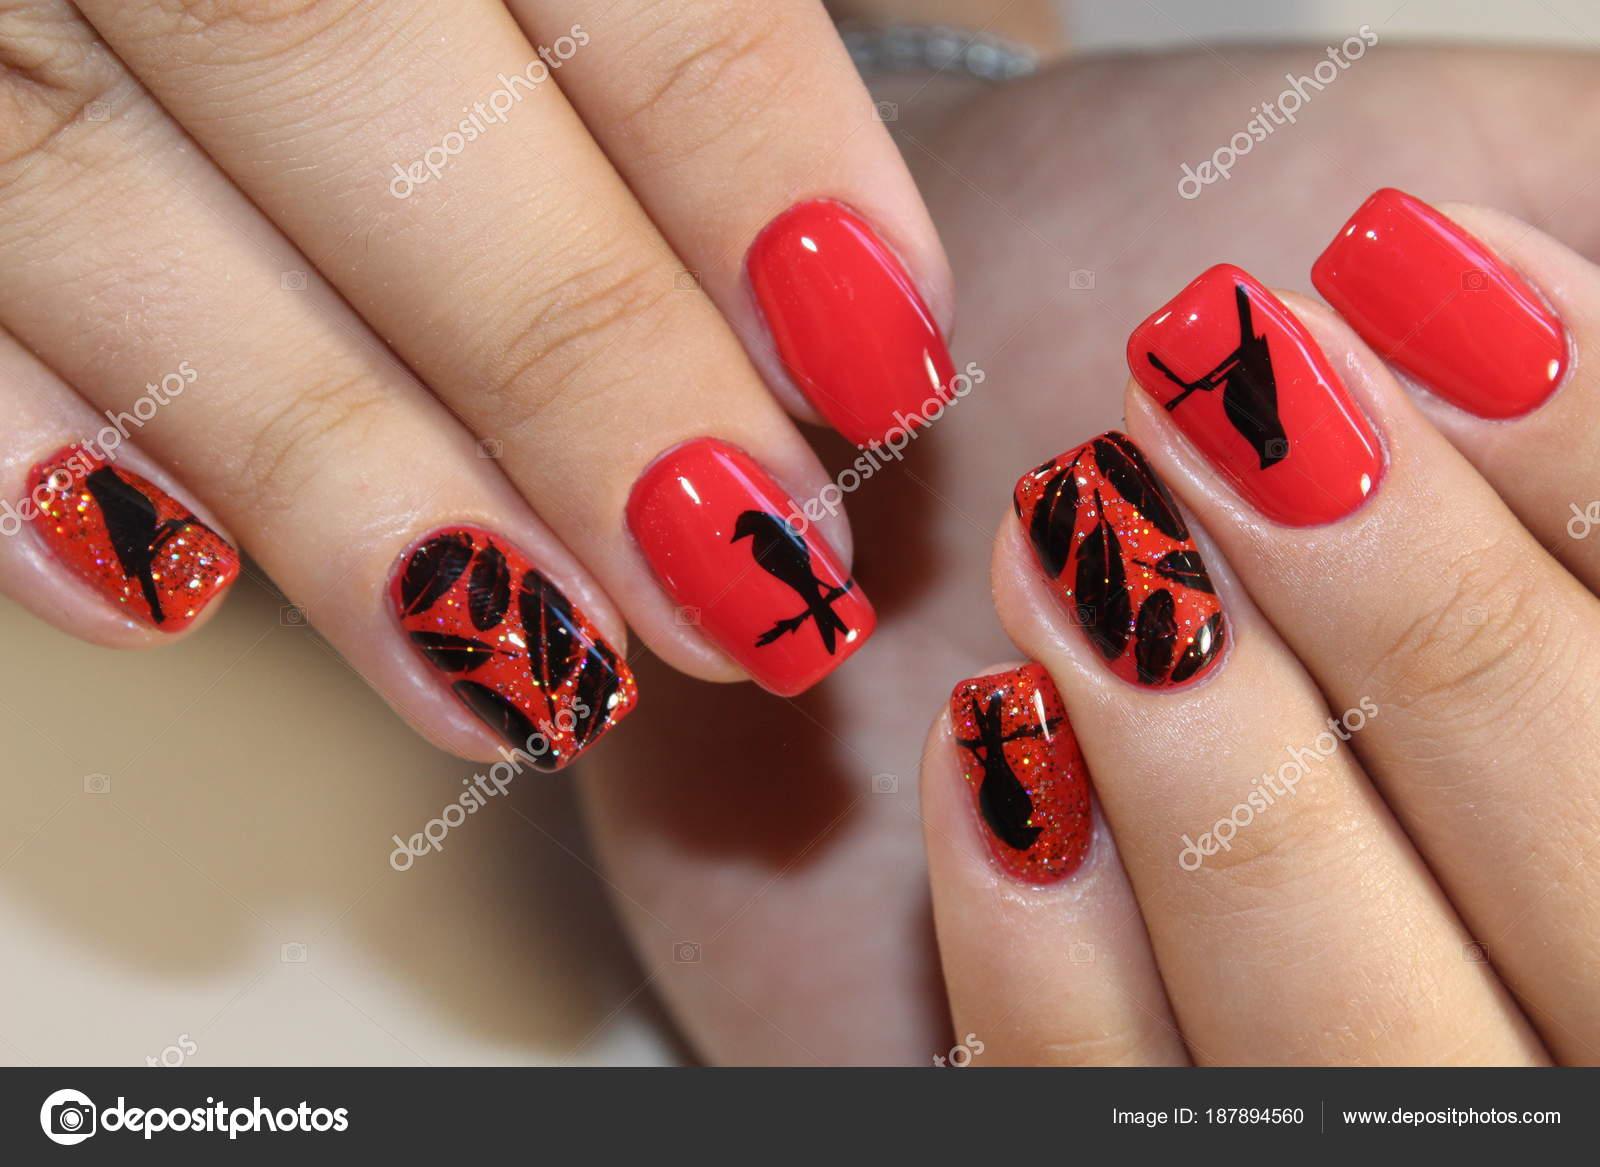 Lovely Fingernägel Design Bilder Decoration Of Maniküre Rote Nägel — Stockfoto